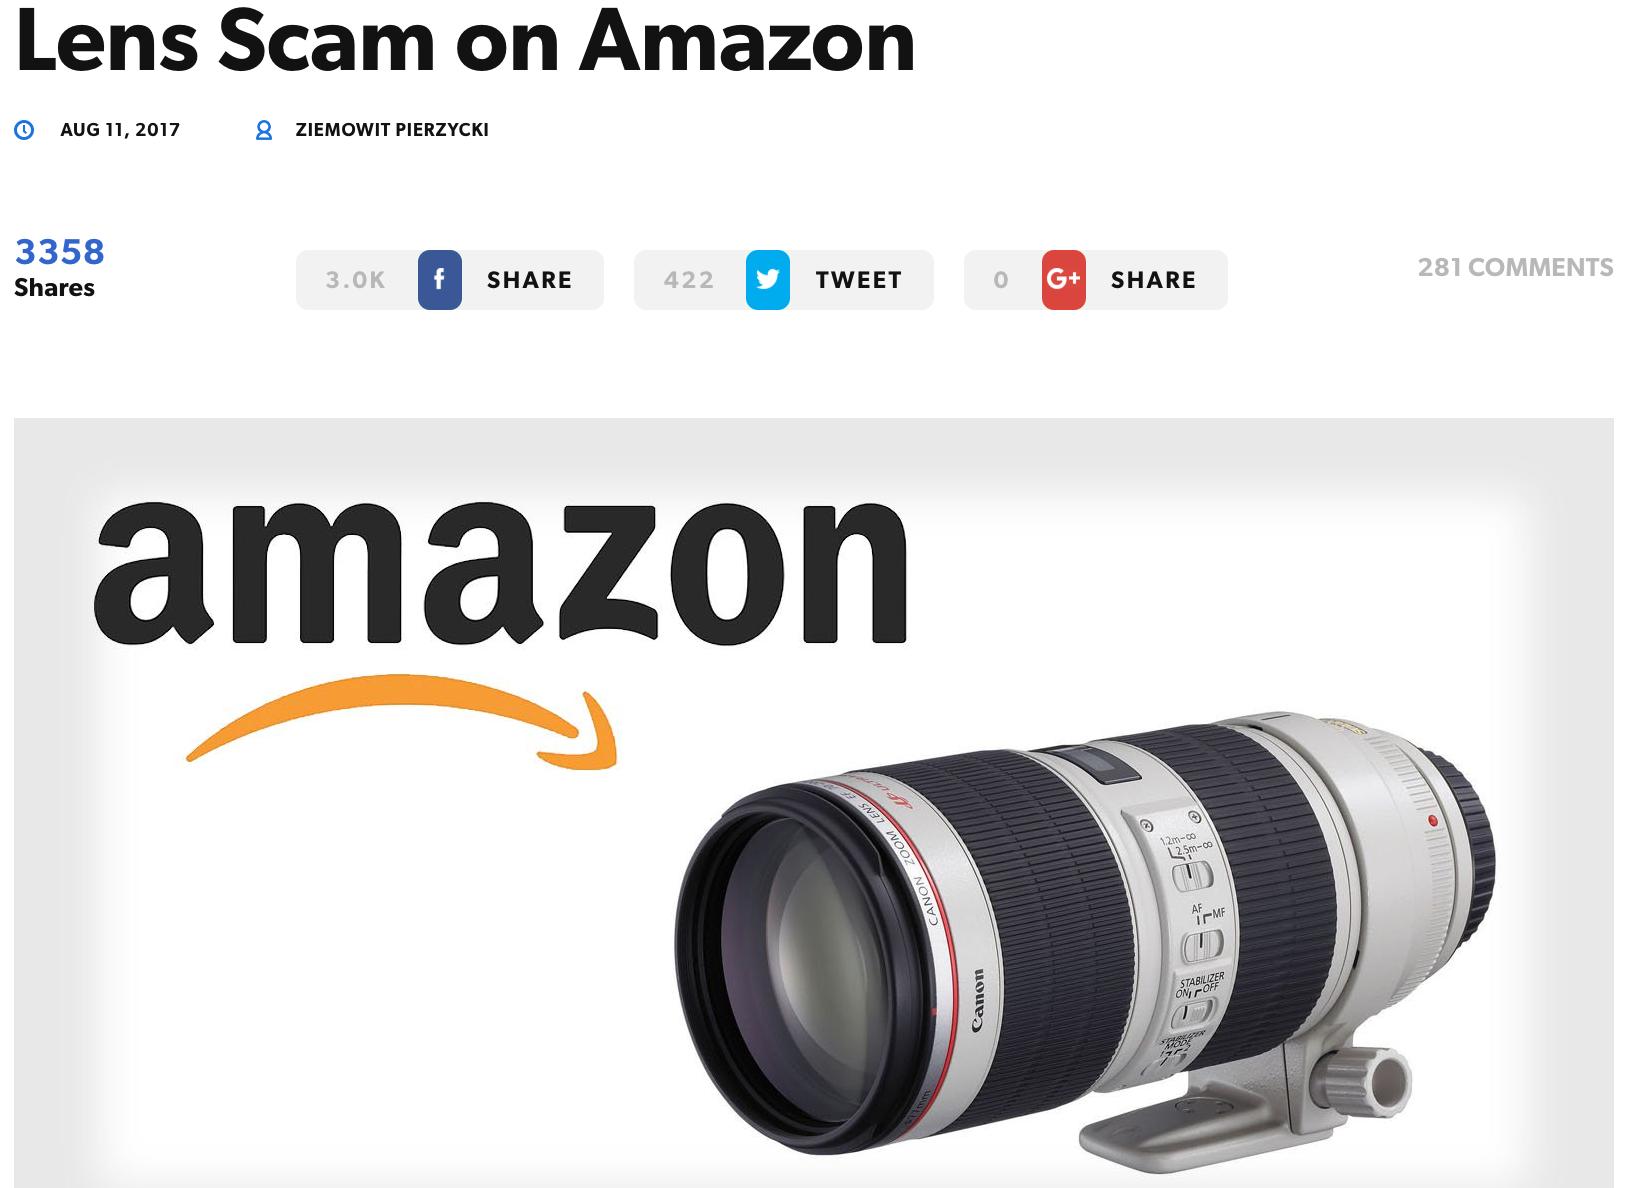 Amazon Camera Lens Scam